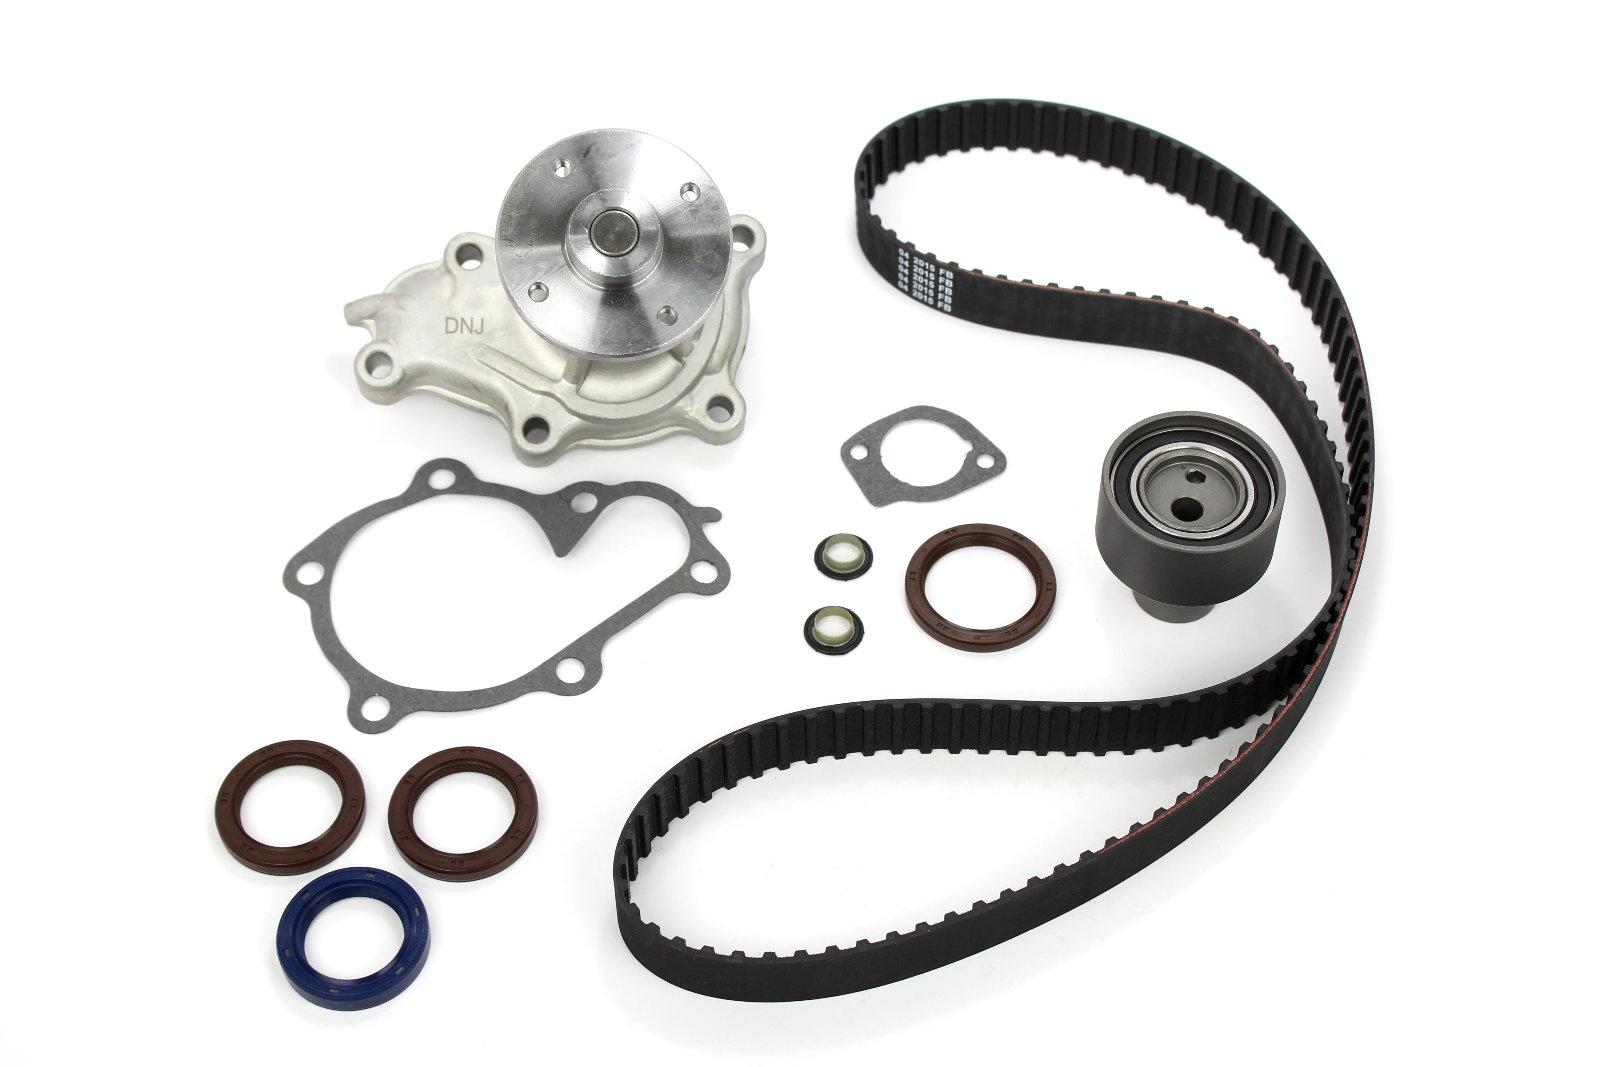 Fits 90~92 Infiniti M30 Timing Belt Kit With Water Pump - 3.0 Liter V6